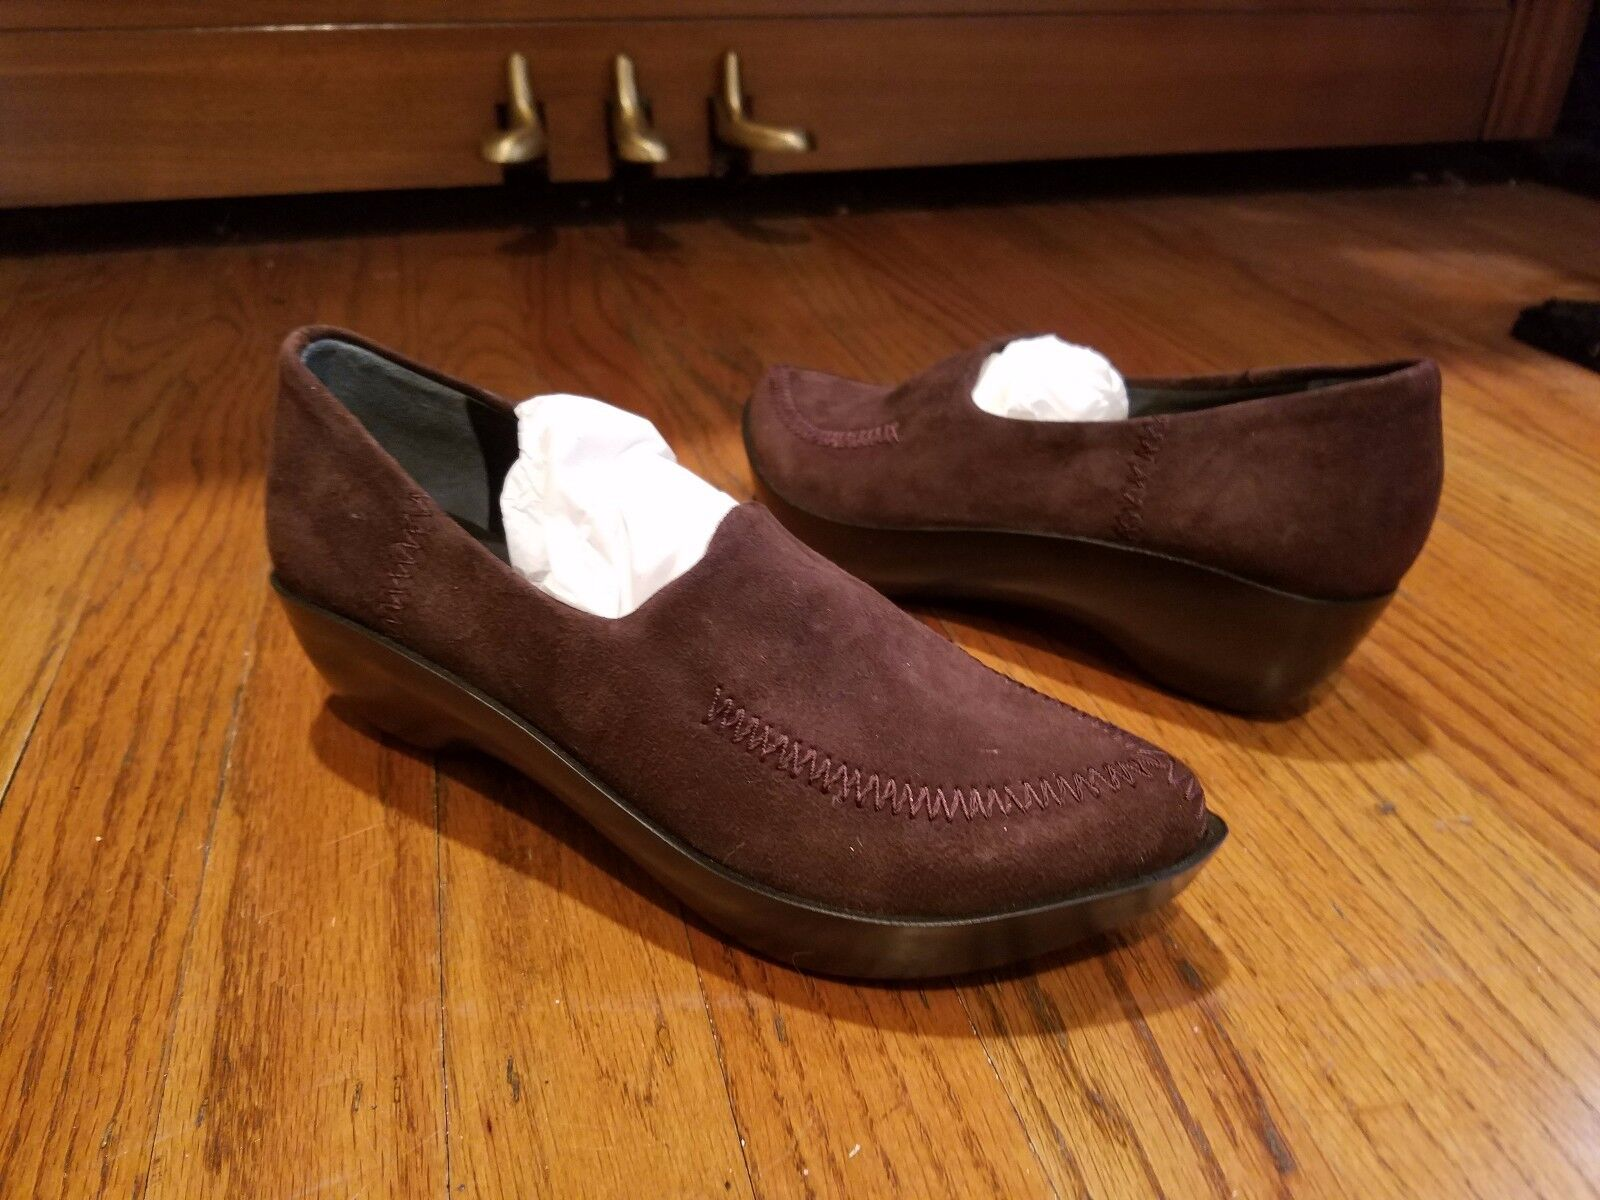 NUOVO Robert Clerserie  Marronee Suede Leather Platform SlideOn Walking scarpe 5.5 1  2  si affrettò a vedere